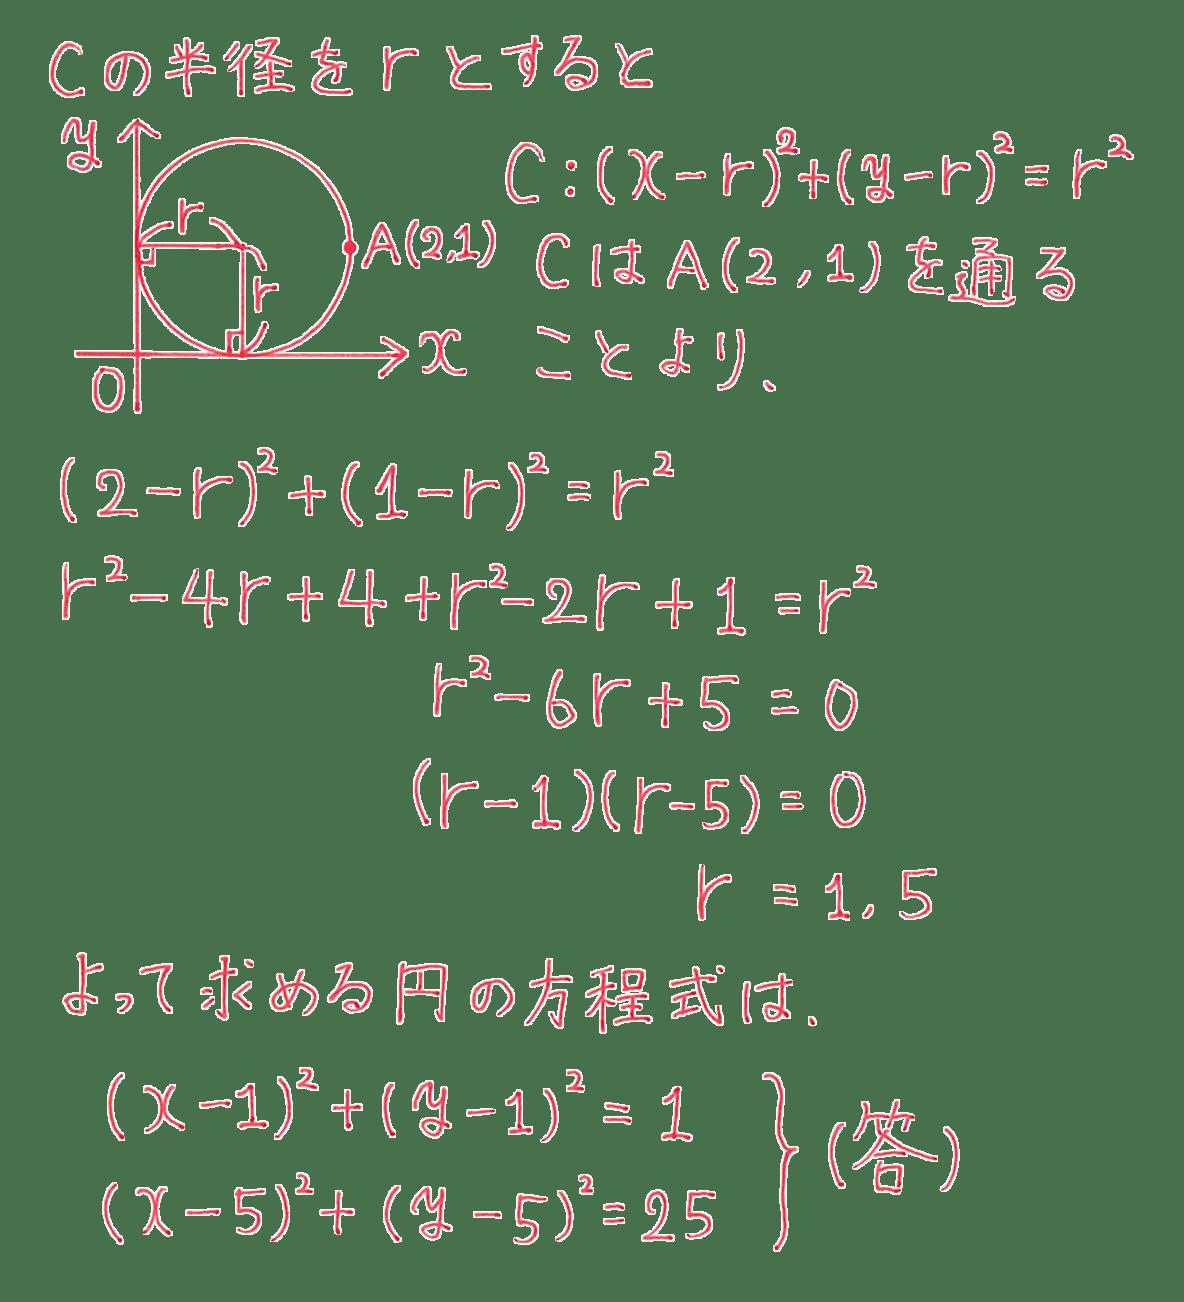 高校数学Ⅱ 図形と方程式18 練習 答え